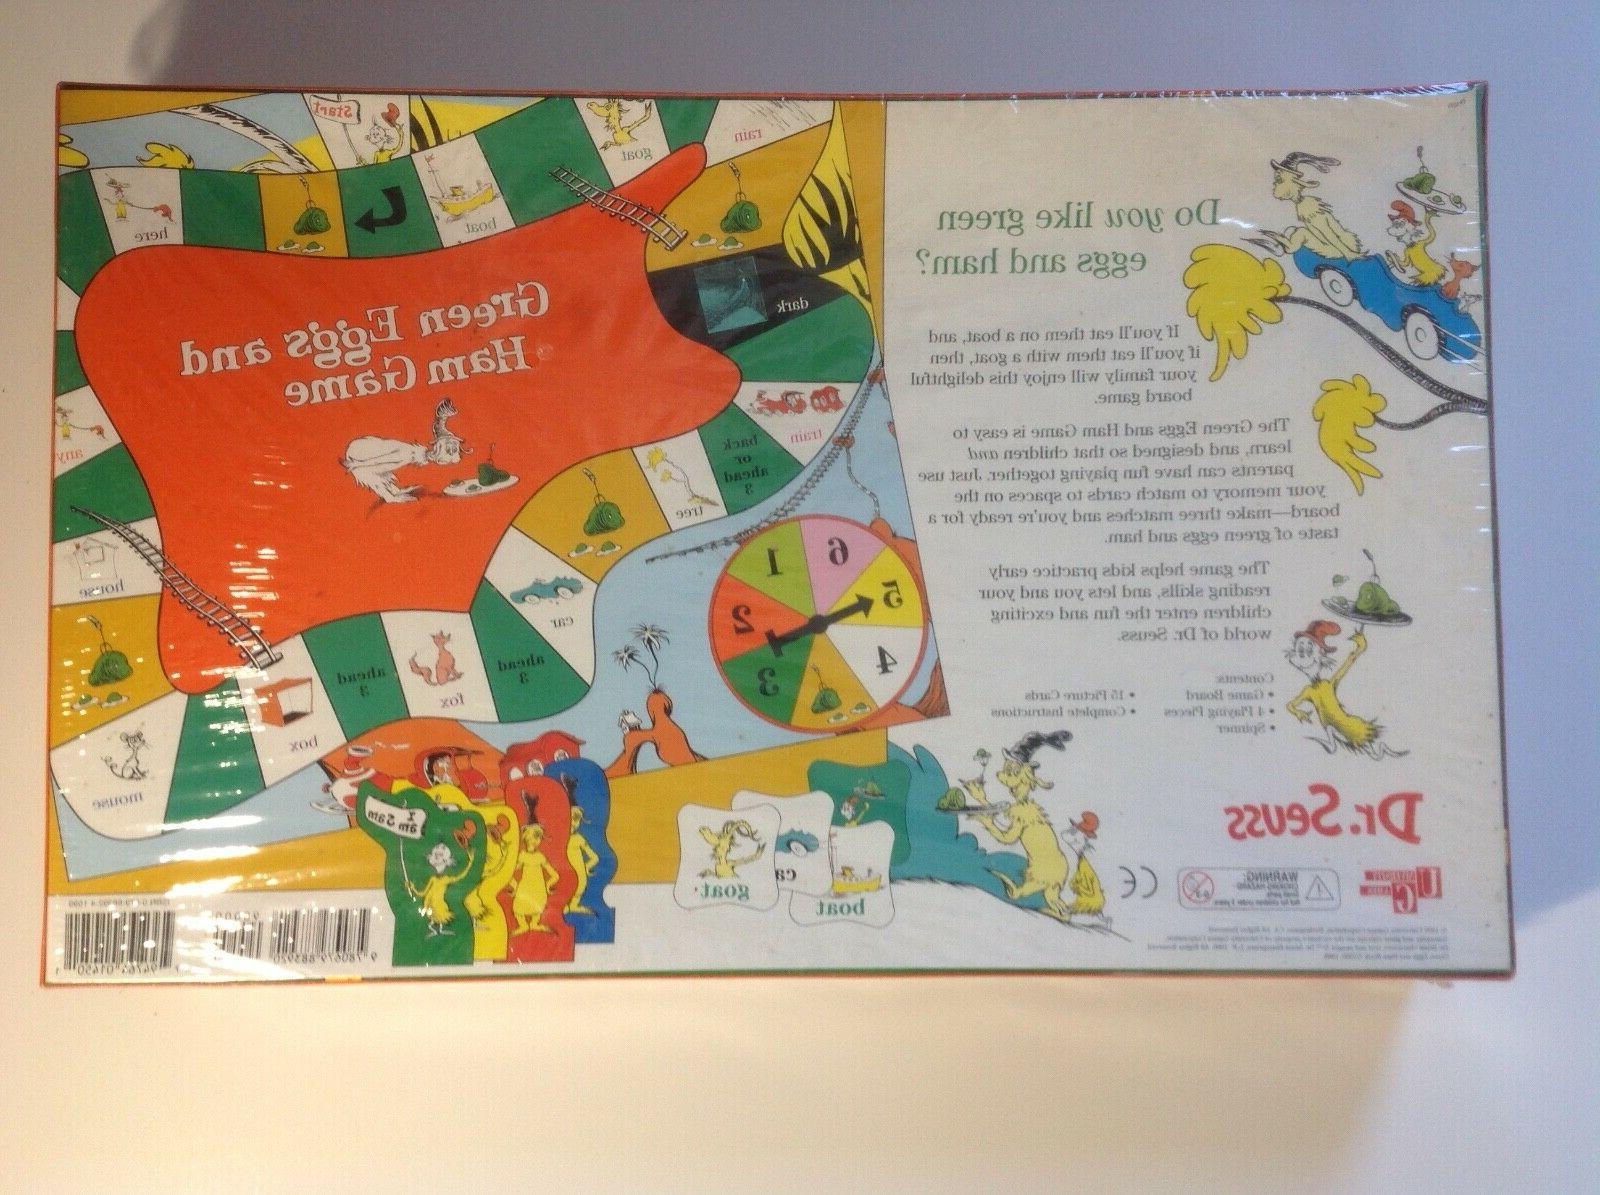 Dr. Green & Board Brand 1996